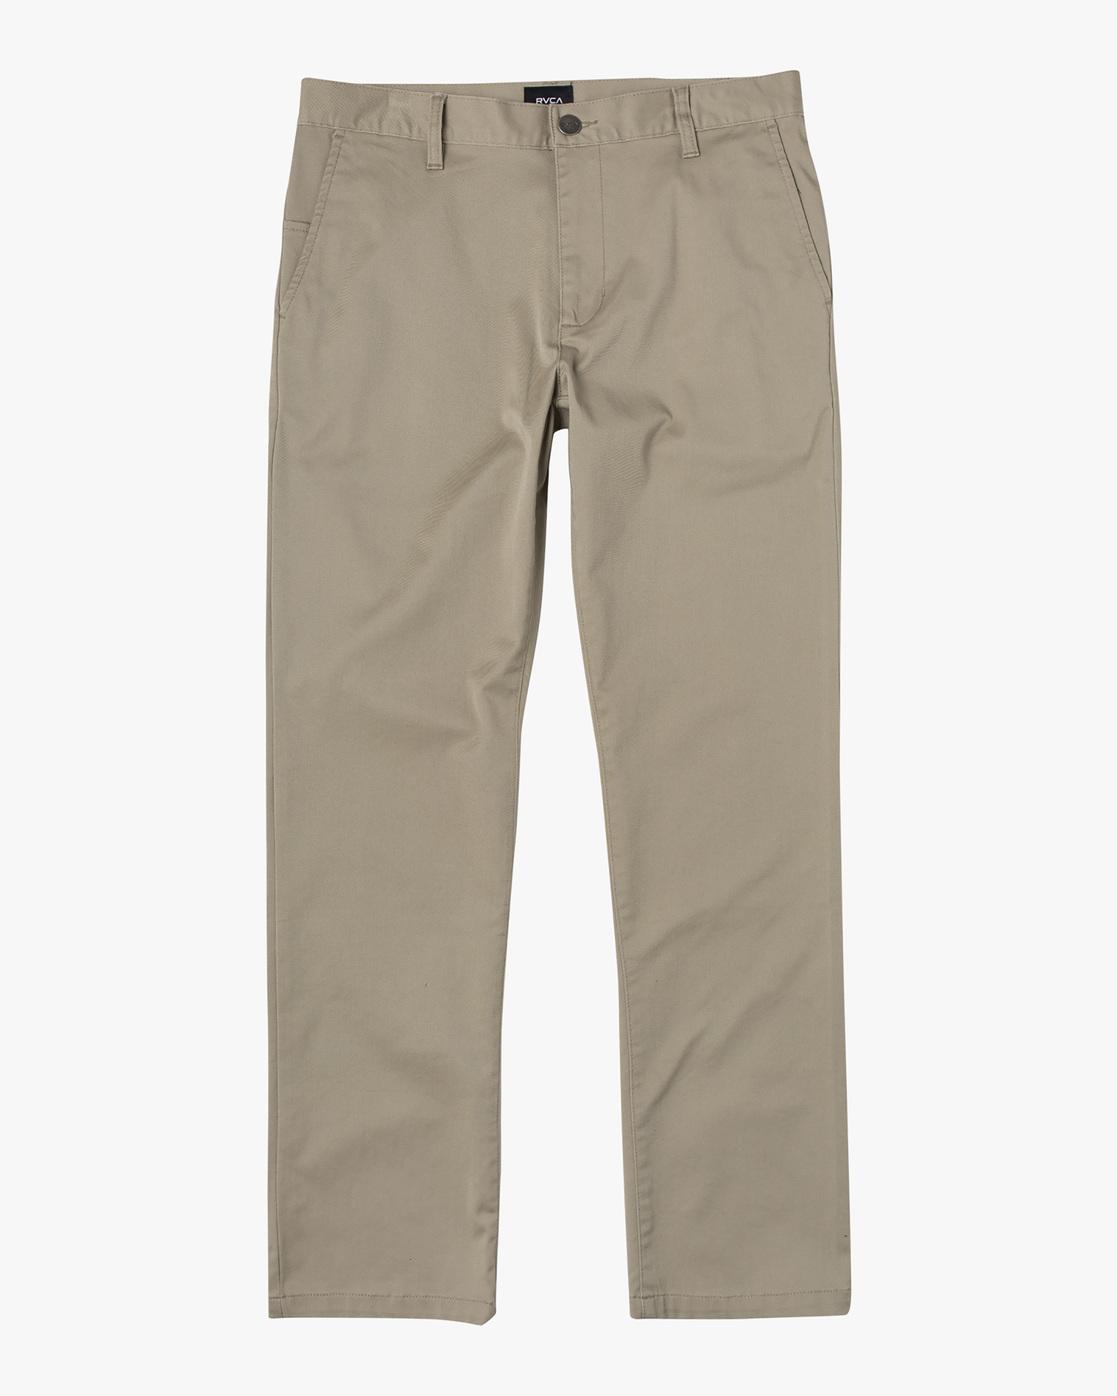 0 week-end Stretch straight fit Pant Beige M3493RWS RVCA